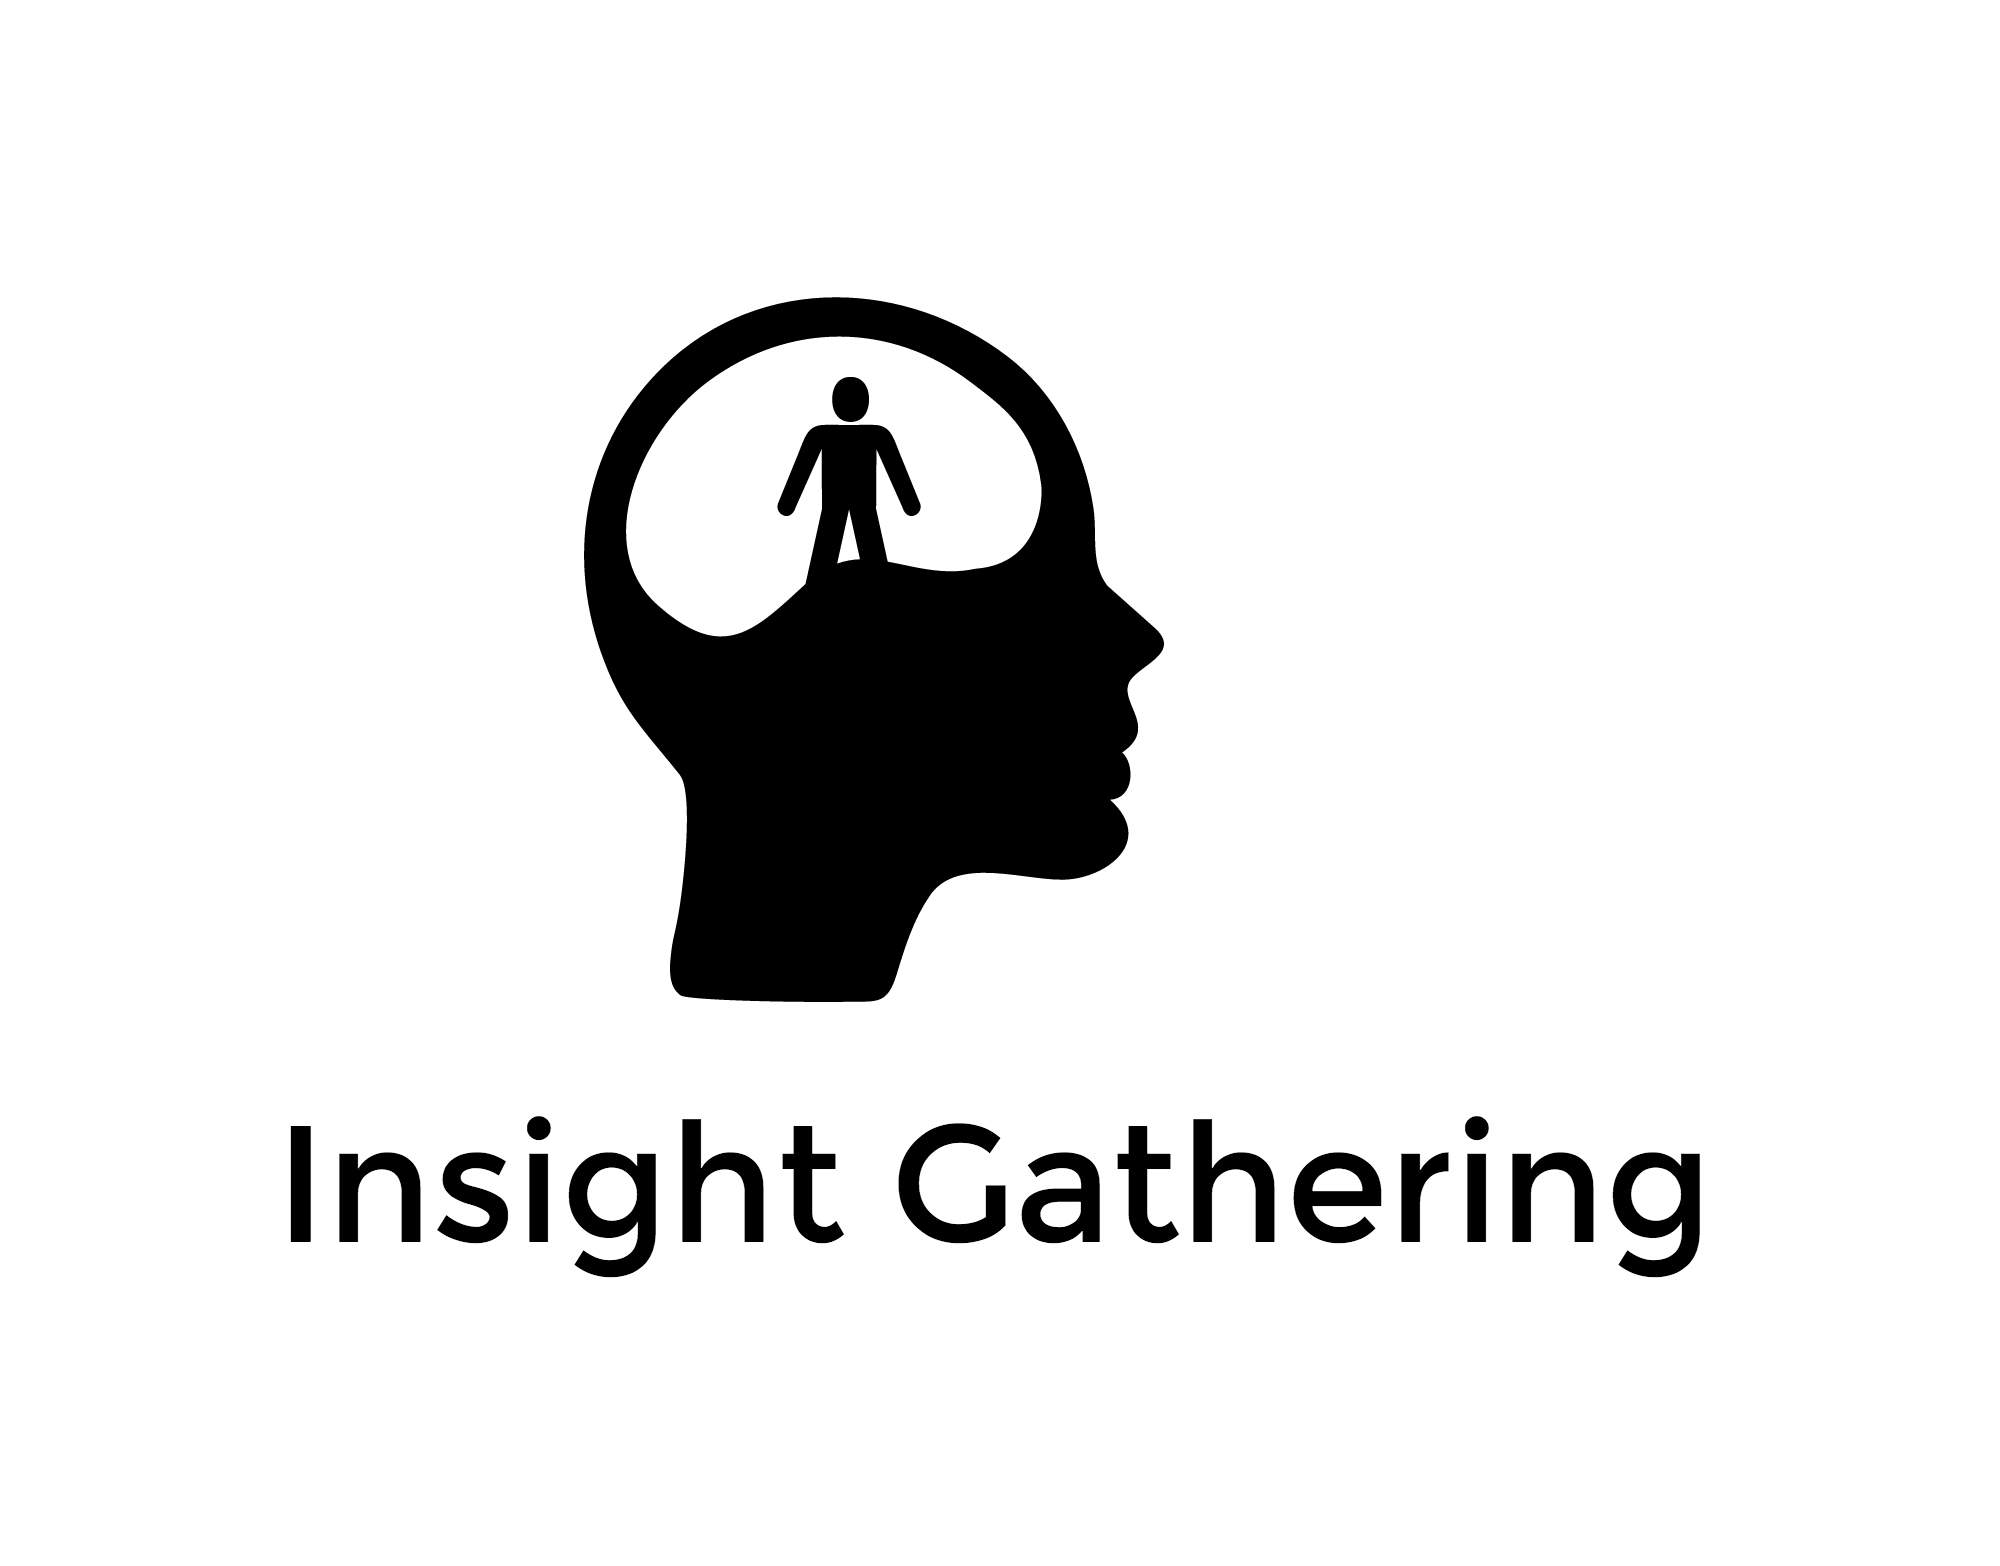 logo-black(2).png